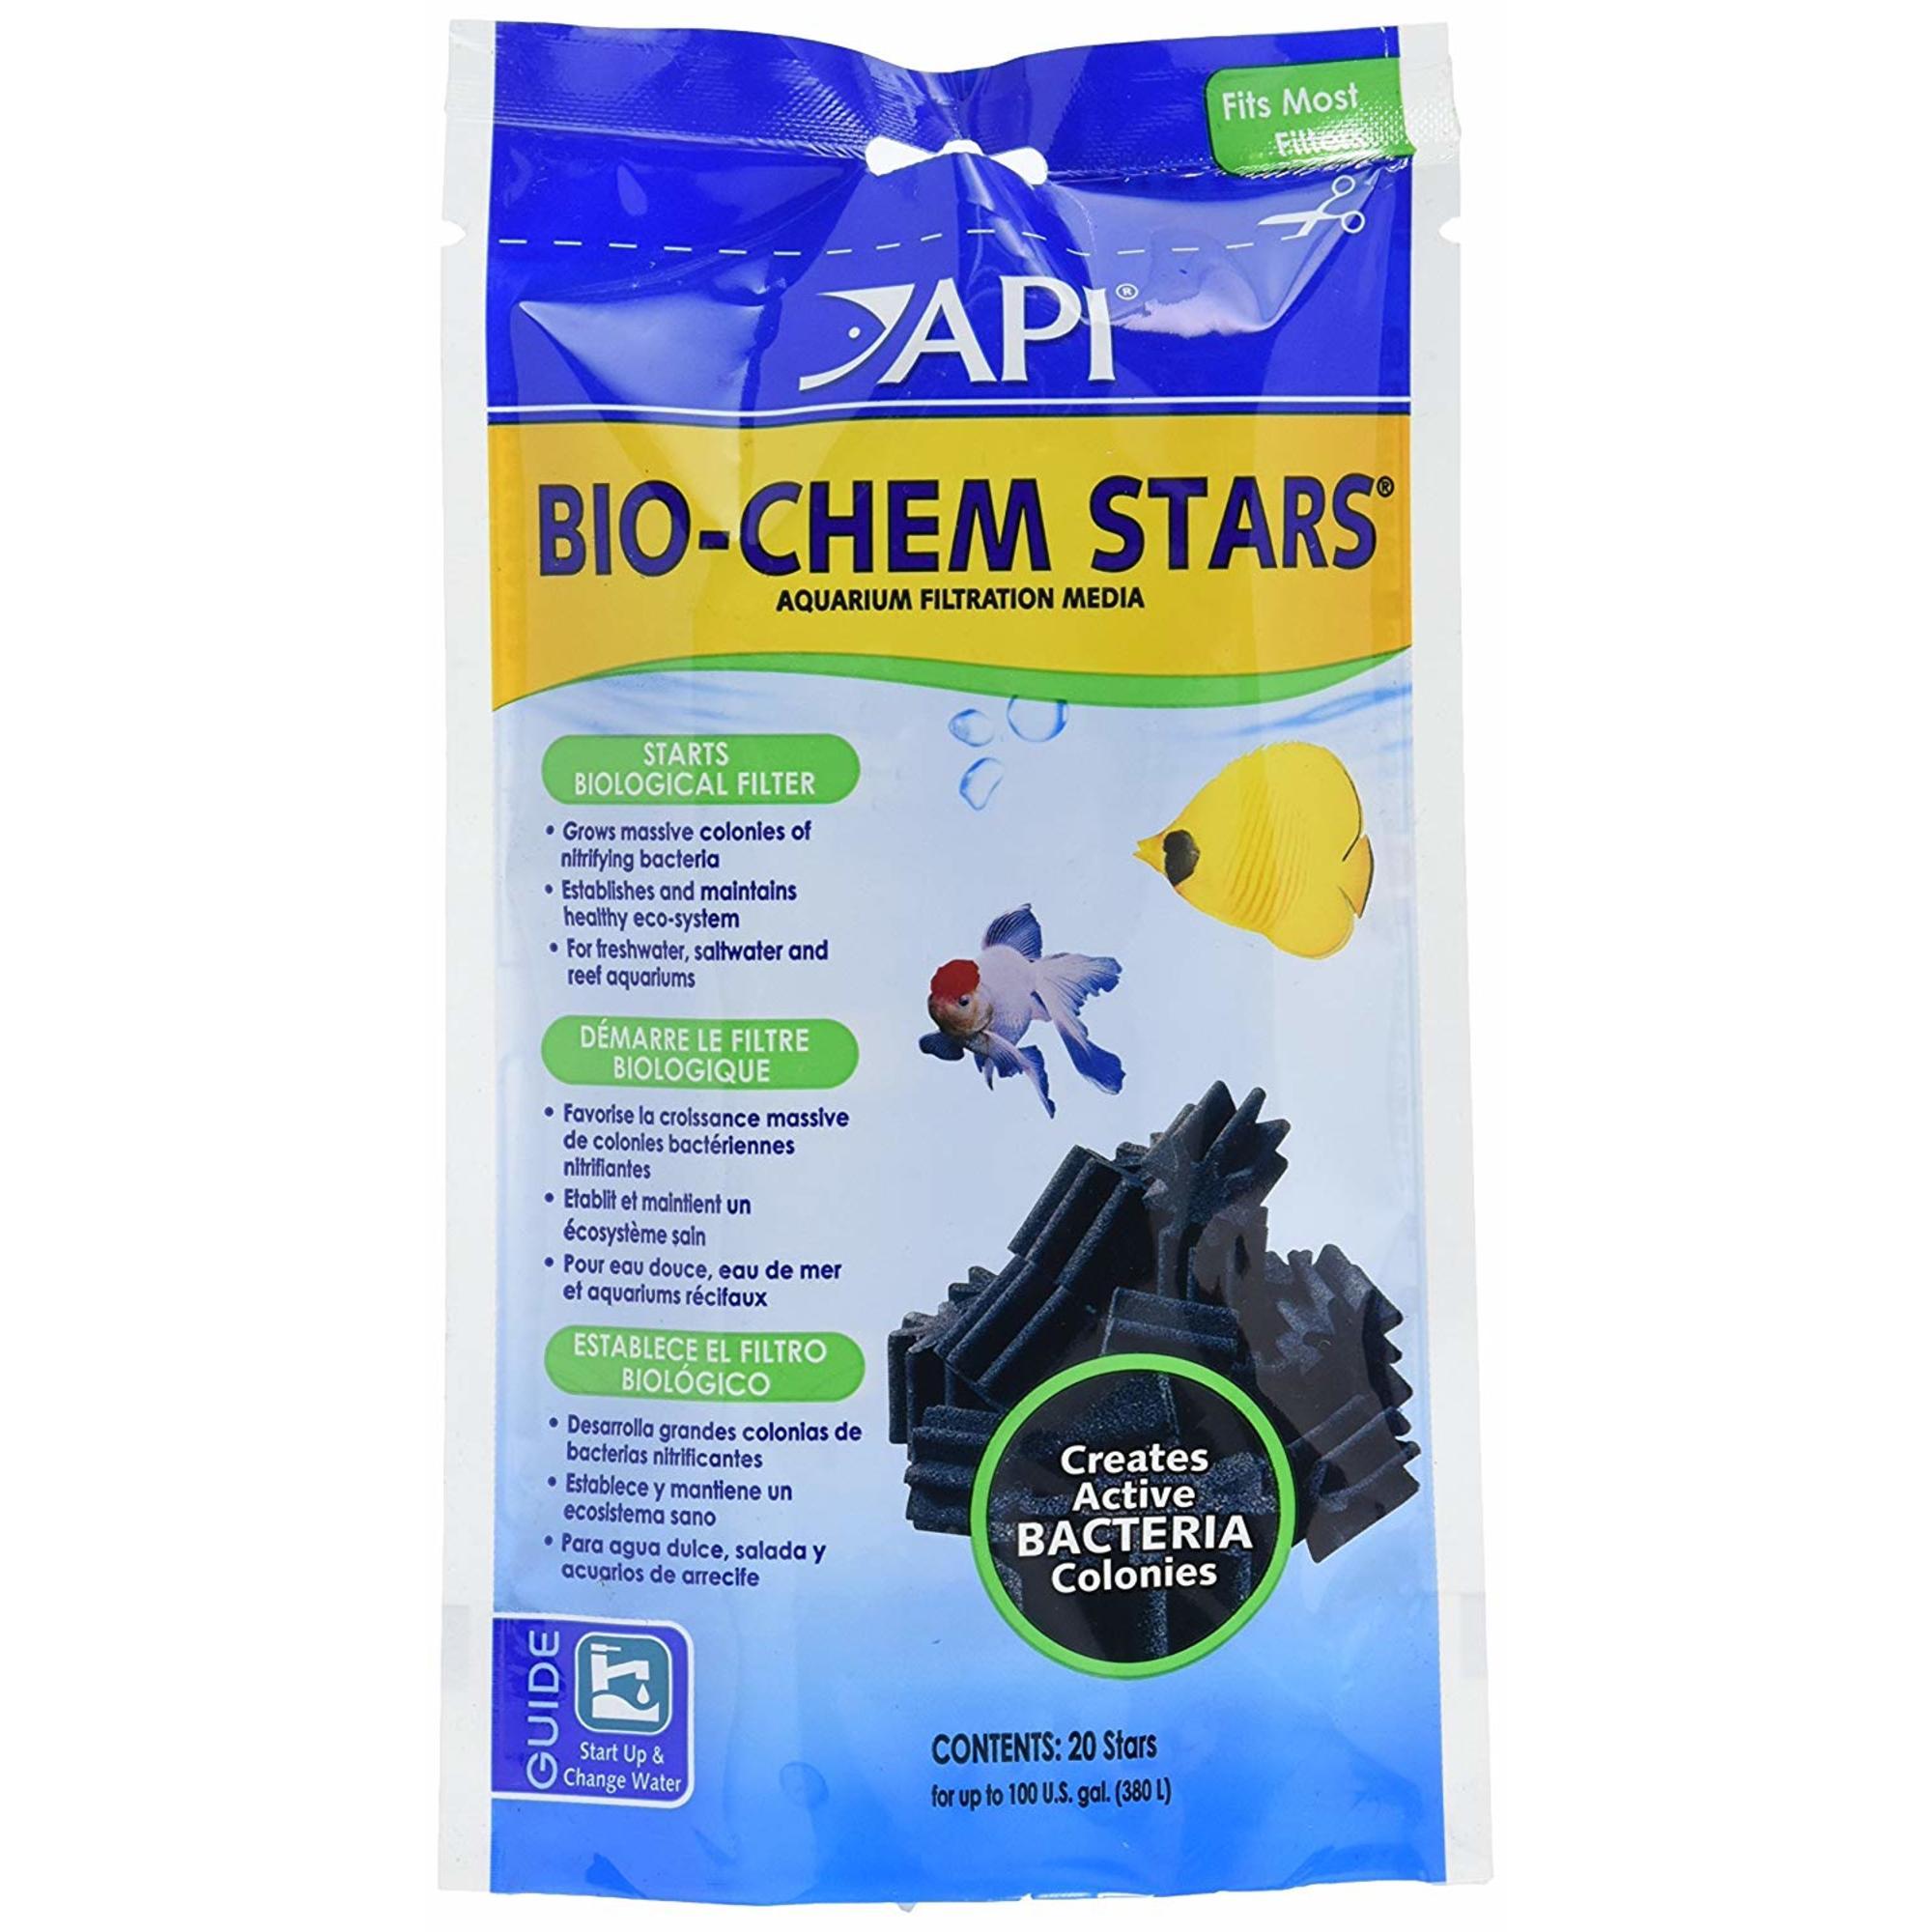 BIO-CHEM STARS™